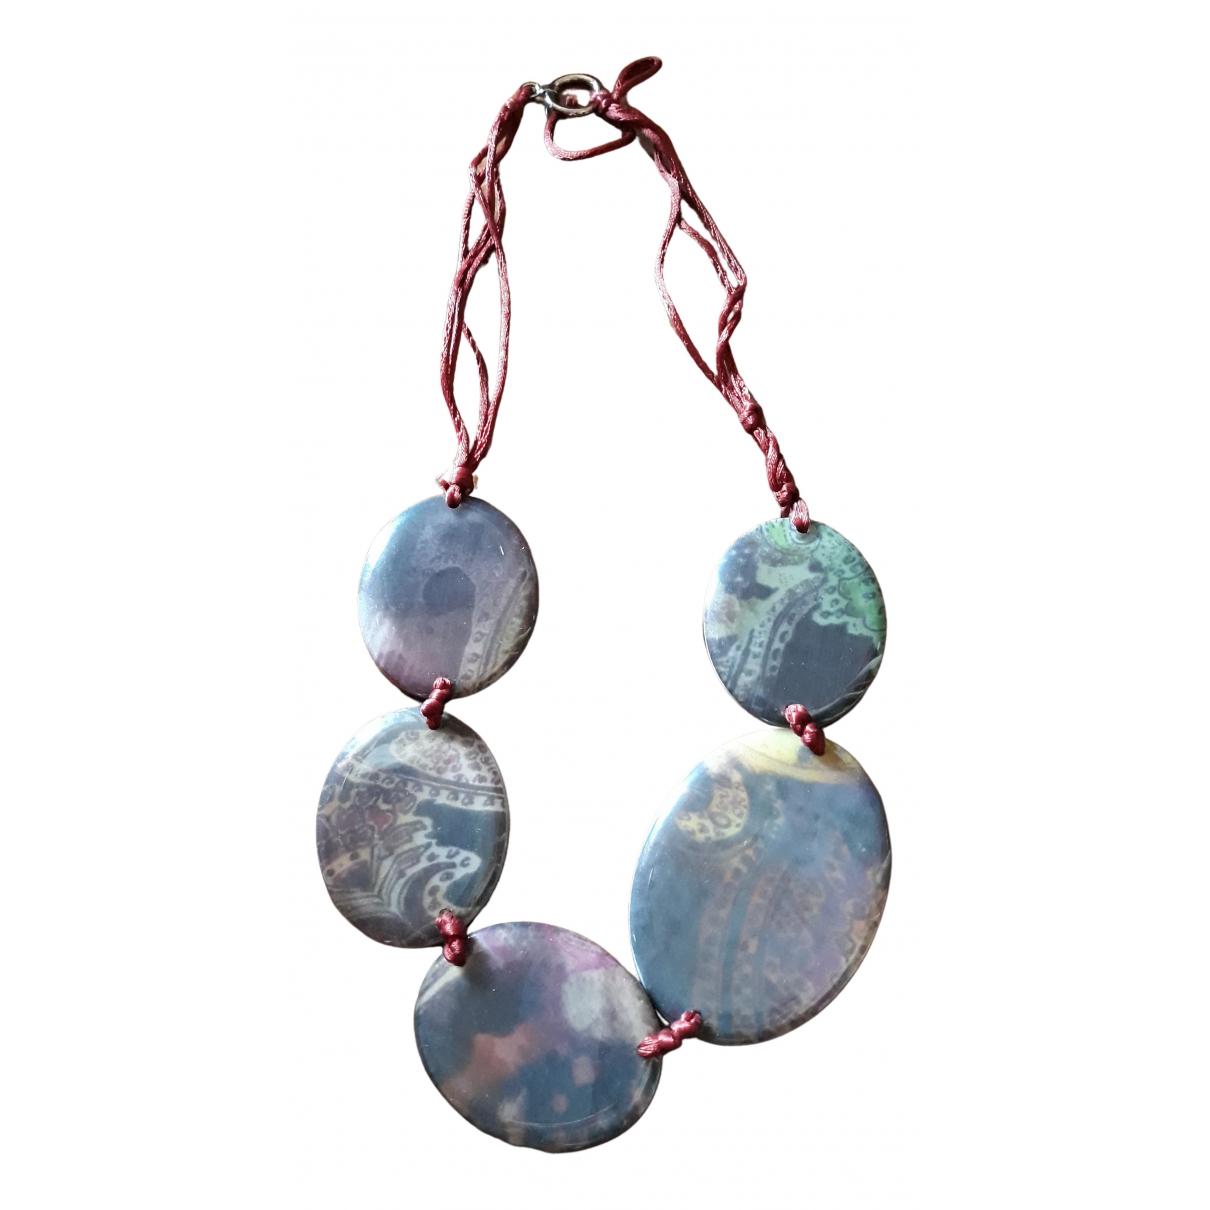 Emporio Armani - Collier   pour femme en perles - multicolore